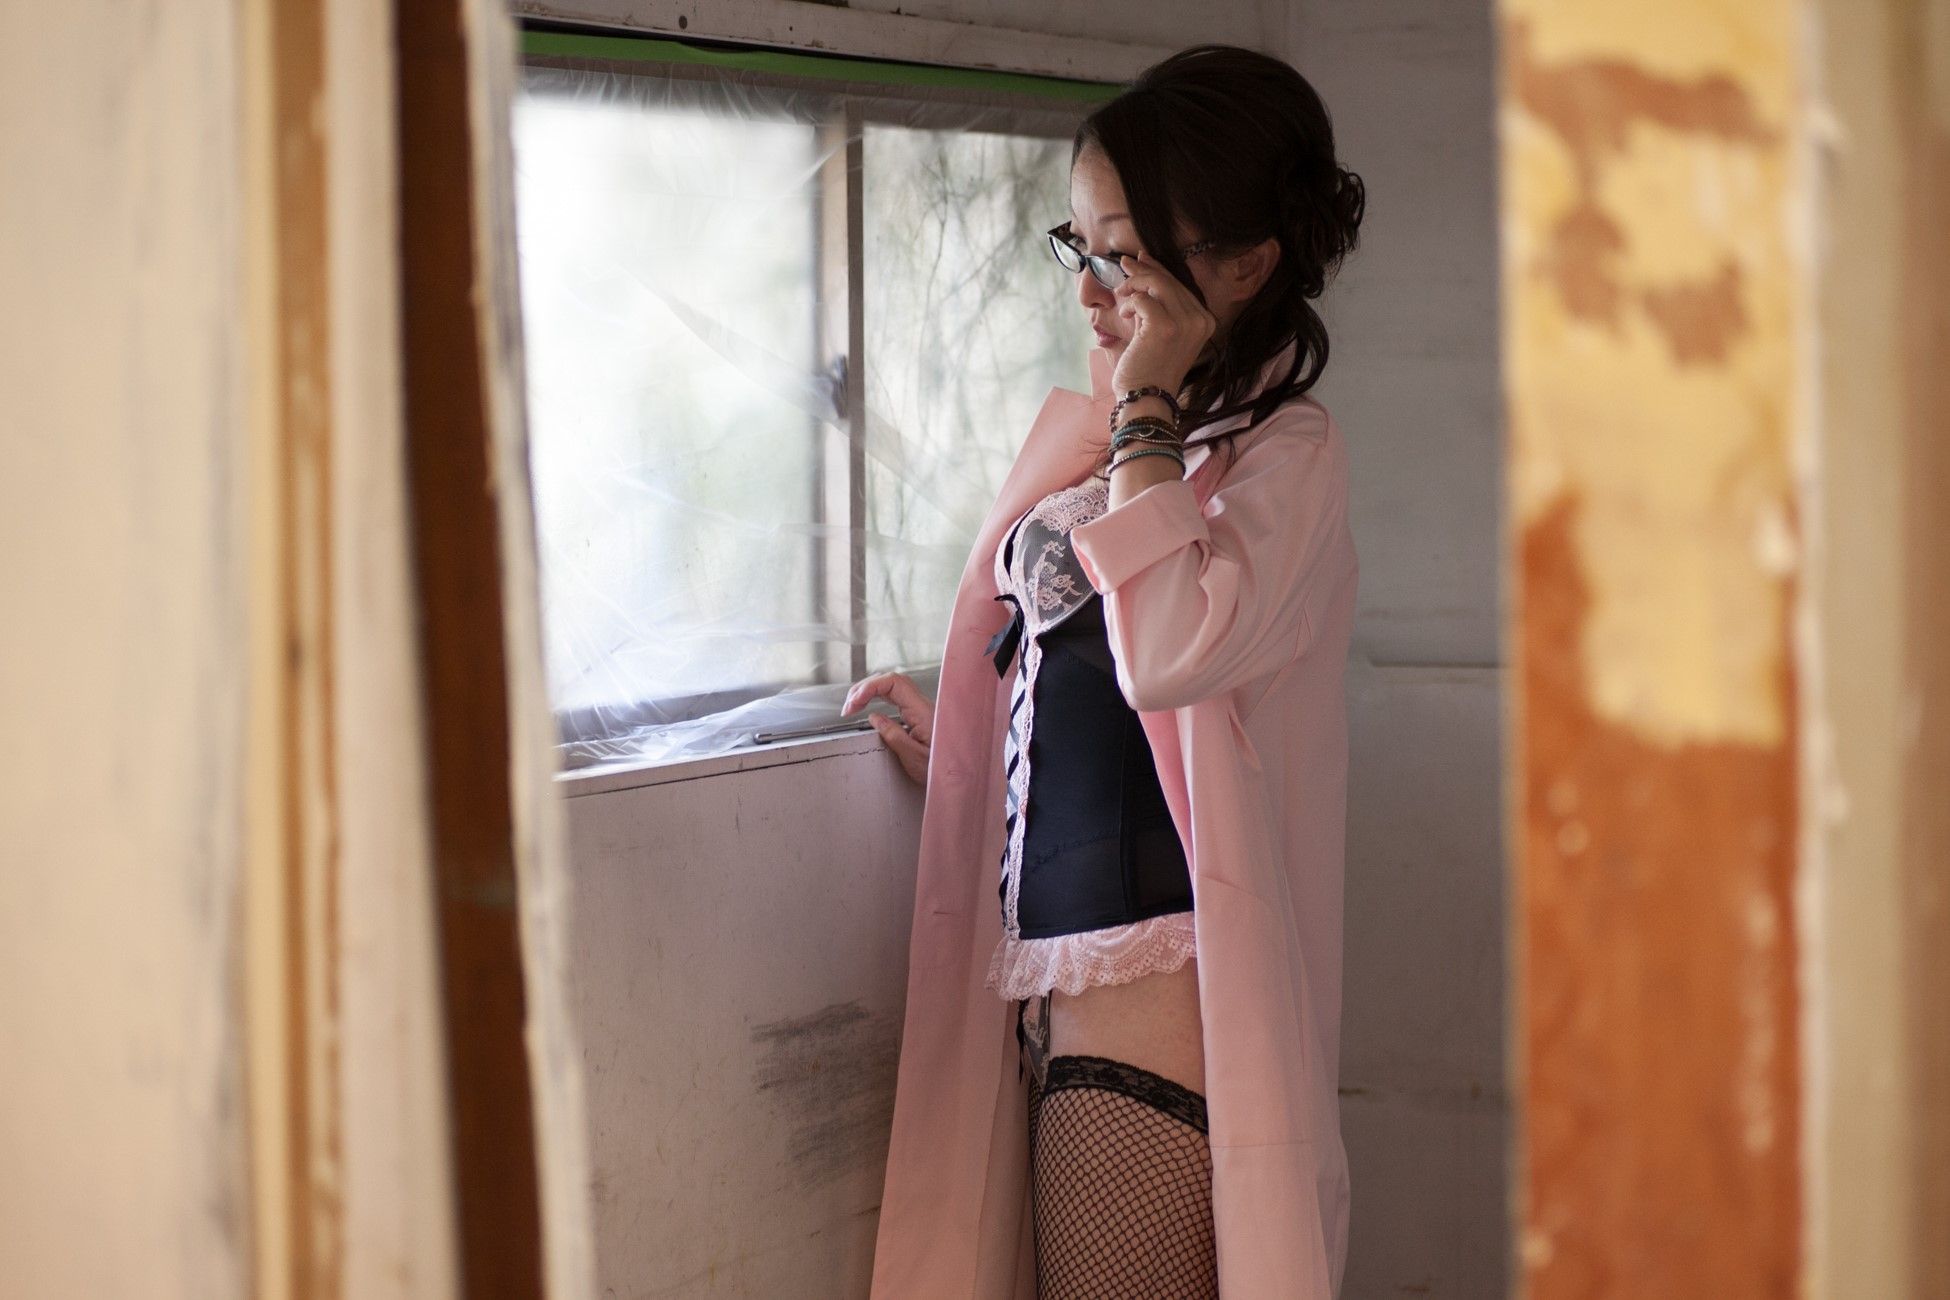 (Photo by Miki Yamato Photography)